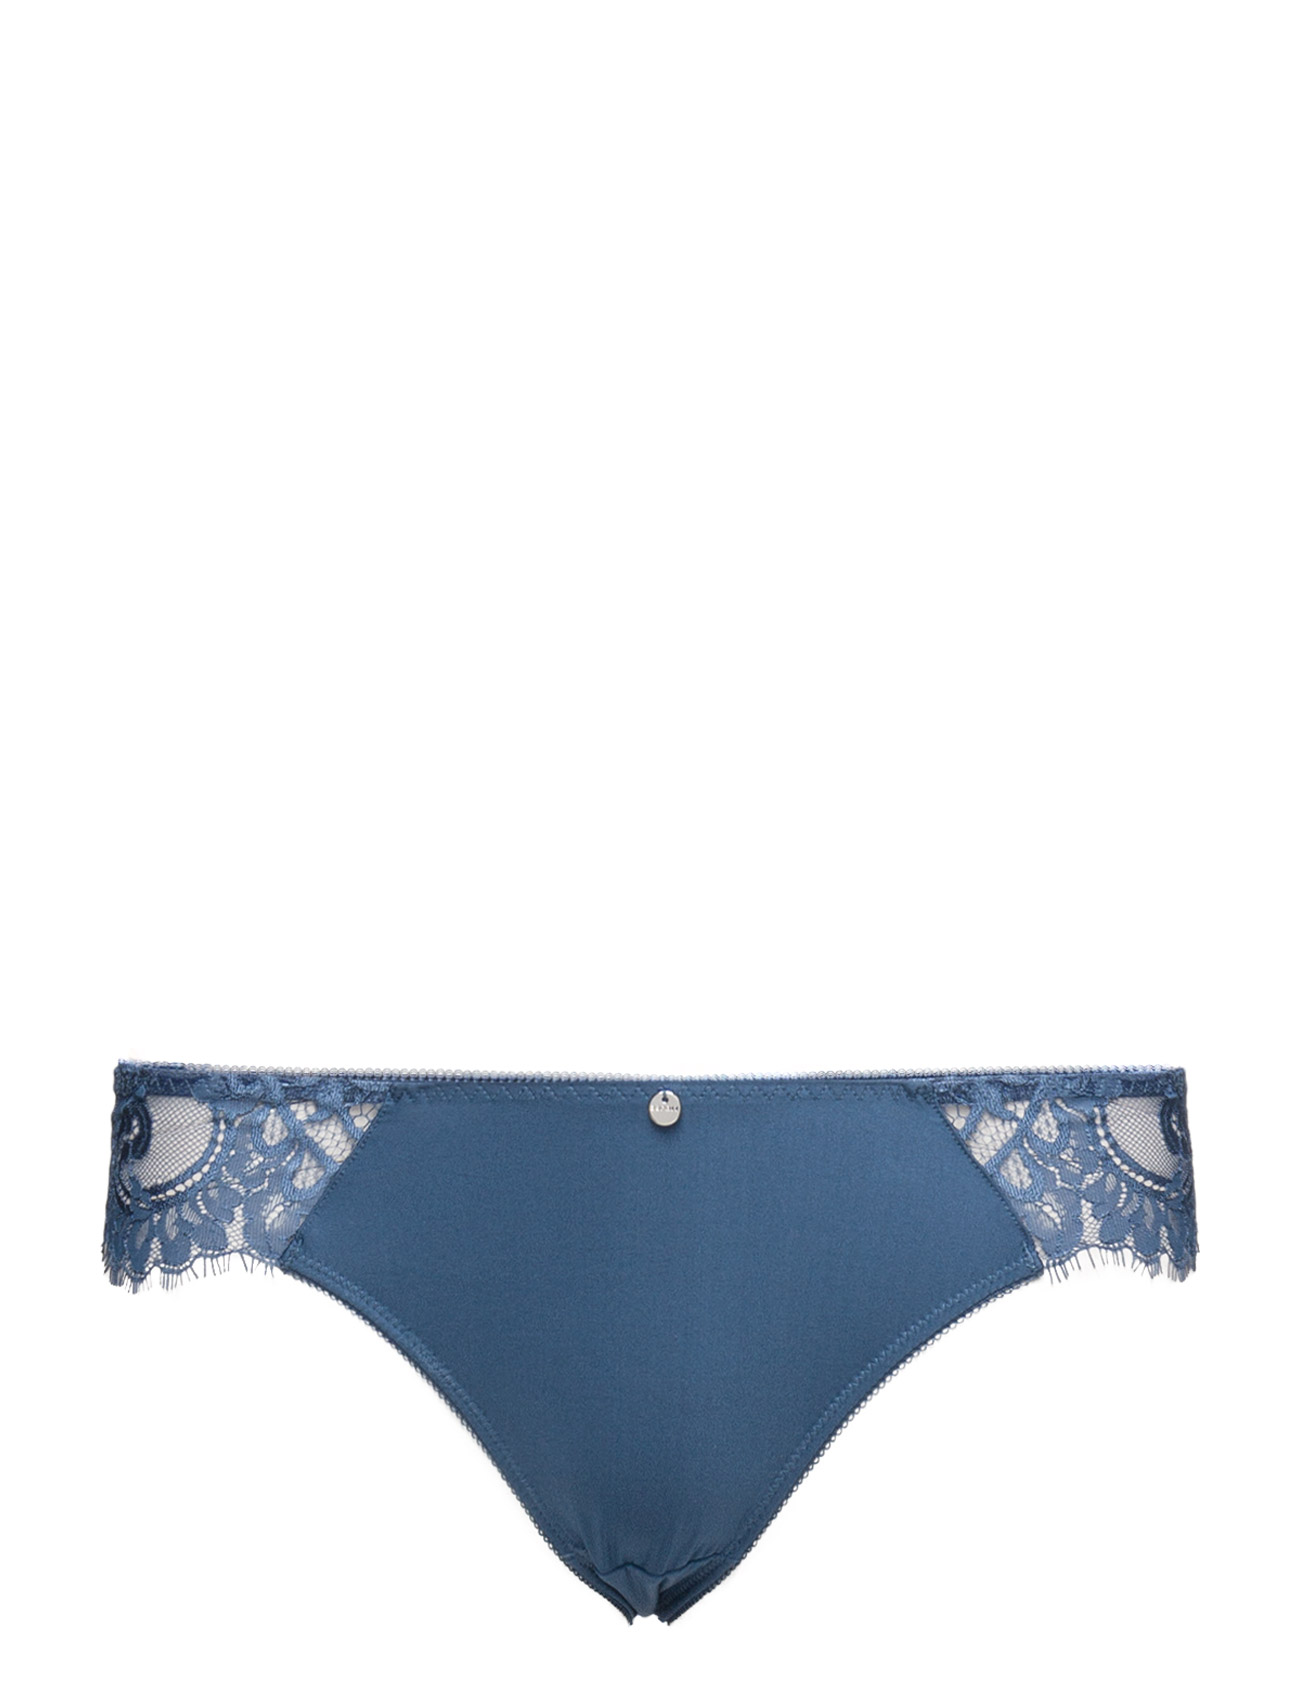 Bottoms Esprit Bodywear Women Trusser til Kvinder i Mørkegrå